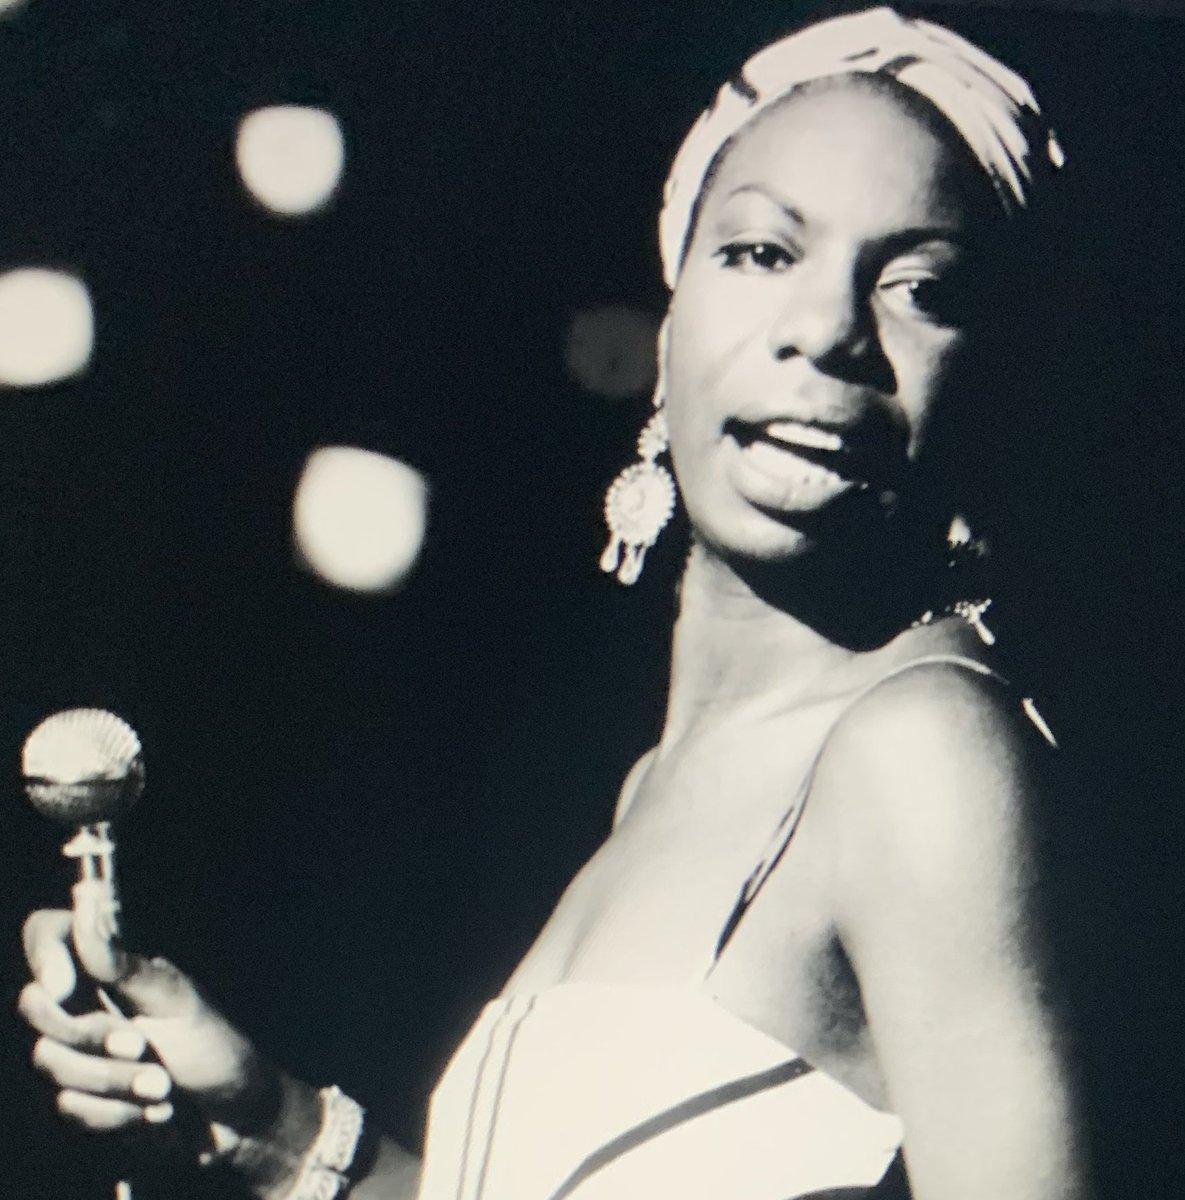 RT @SusanJ009: Nina Simone  -Mr. Bojangles  (Official Audio)    https://t.co/87X23VCd1z https://t.co/Tr8bqbZ1rT